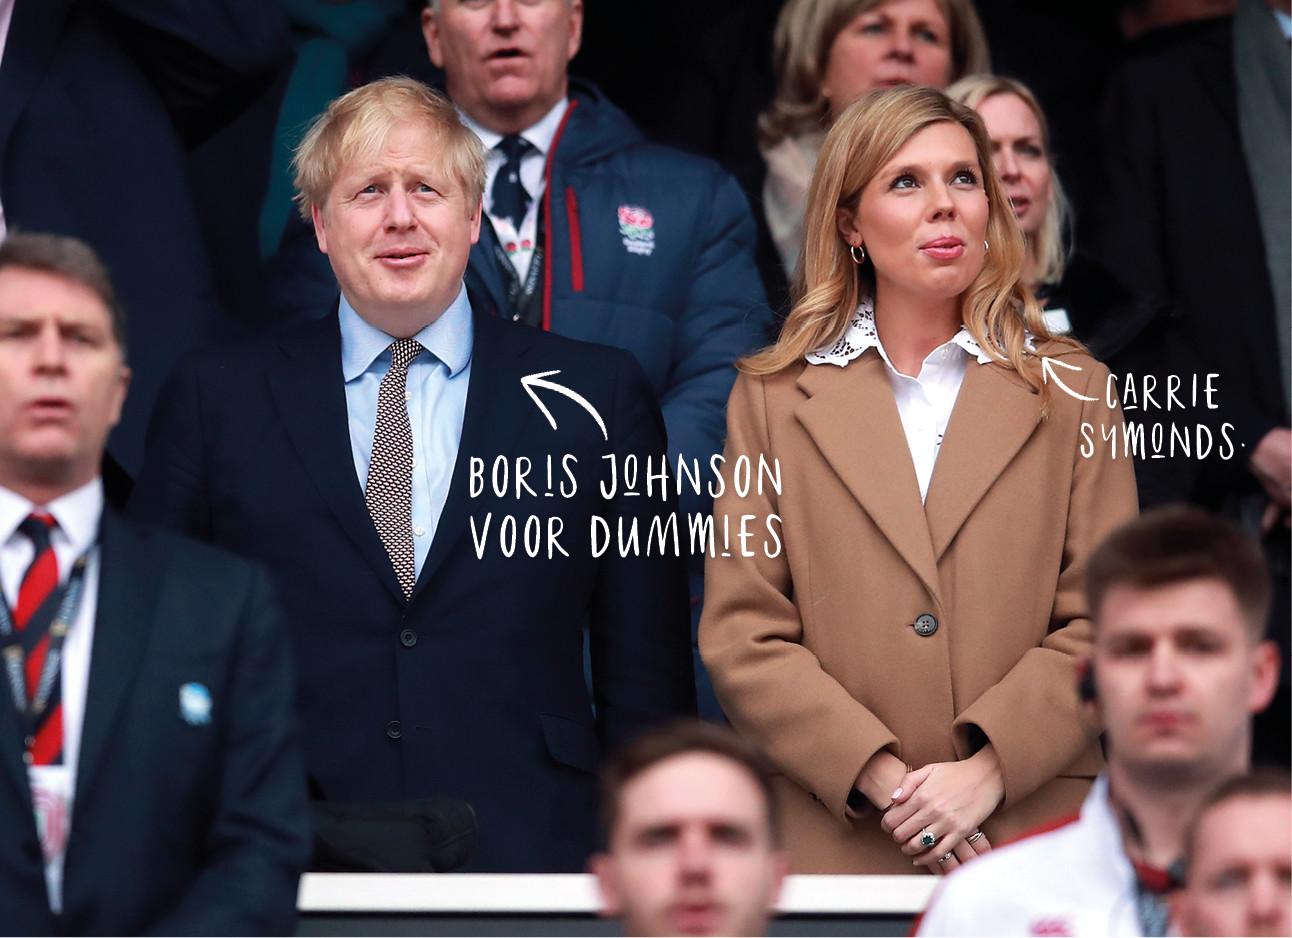 Boris Johnson en Carrie Symonds